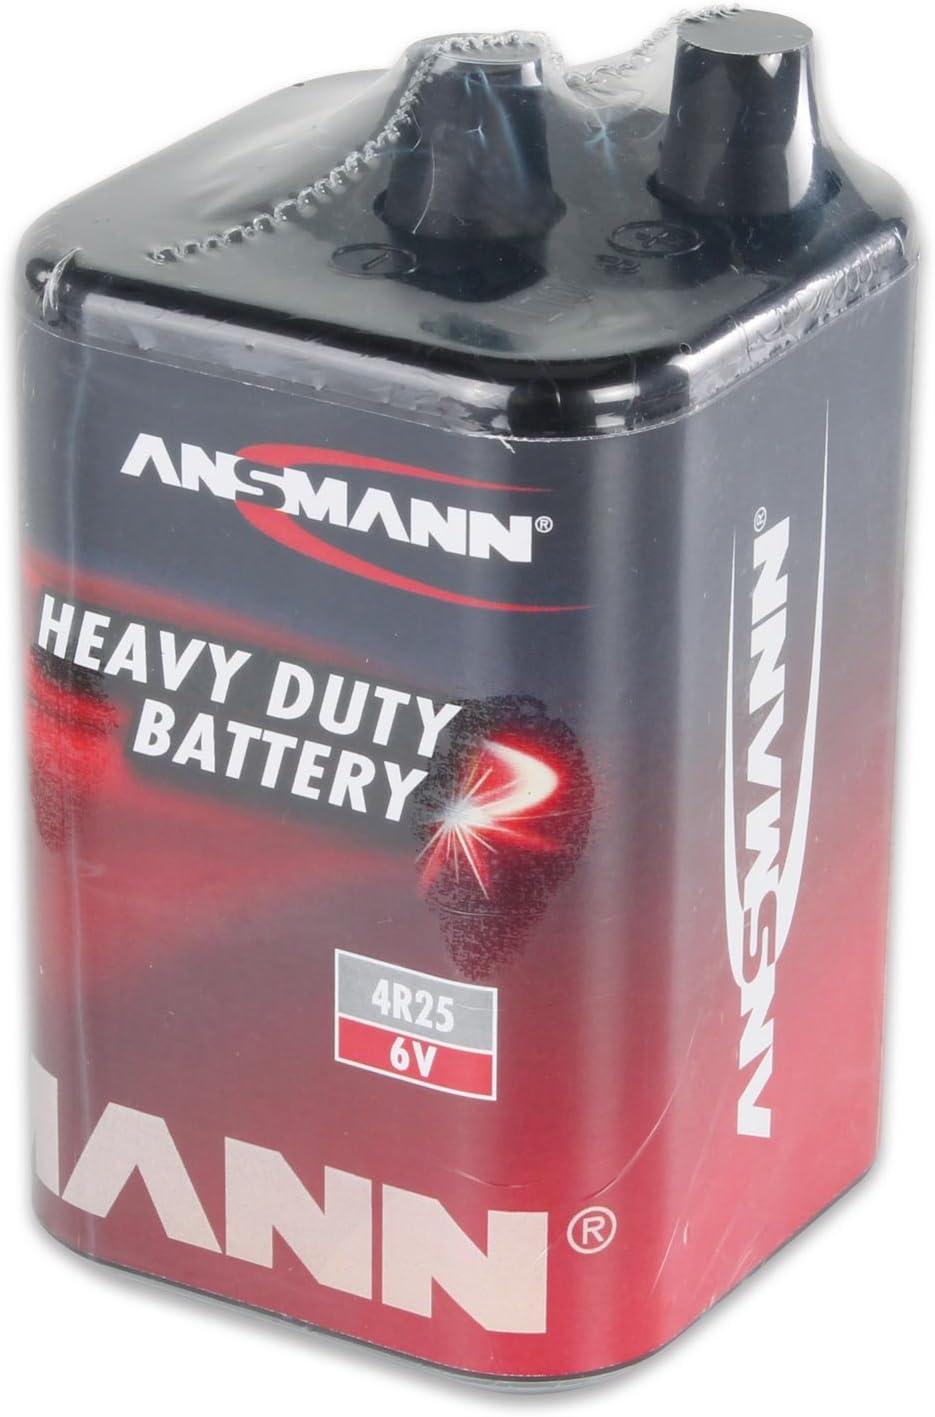 120 Stck Blockbatterie Trockenbatterie 6 Volt Bauleuchtenbatterie Batterie 4R25